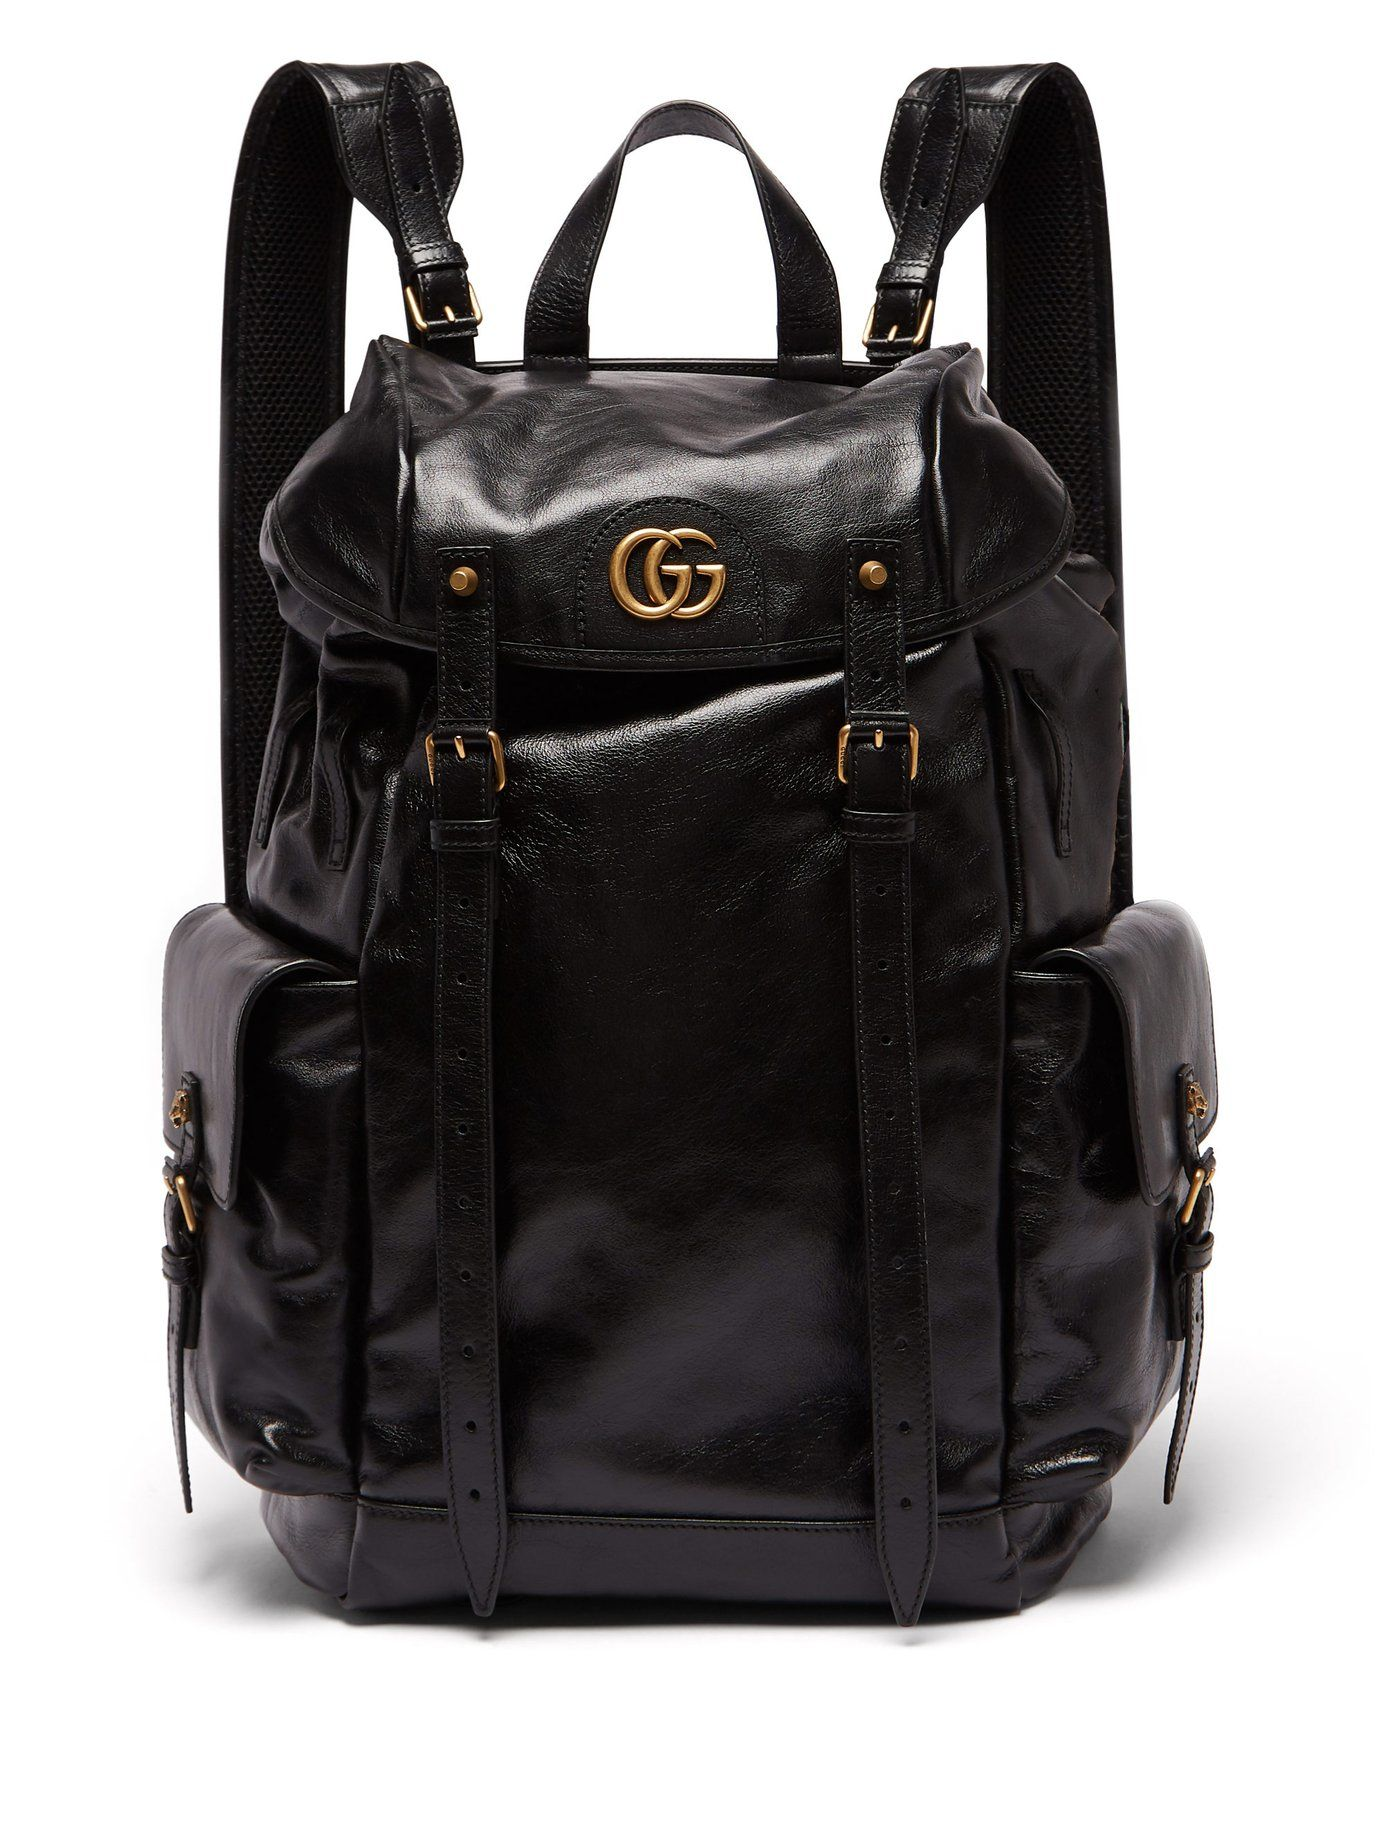 3c1c66837ee Re(Belle) leather backpack